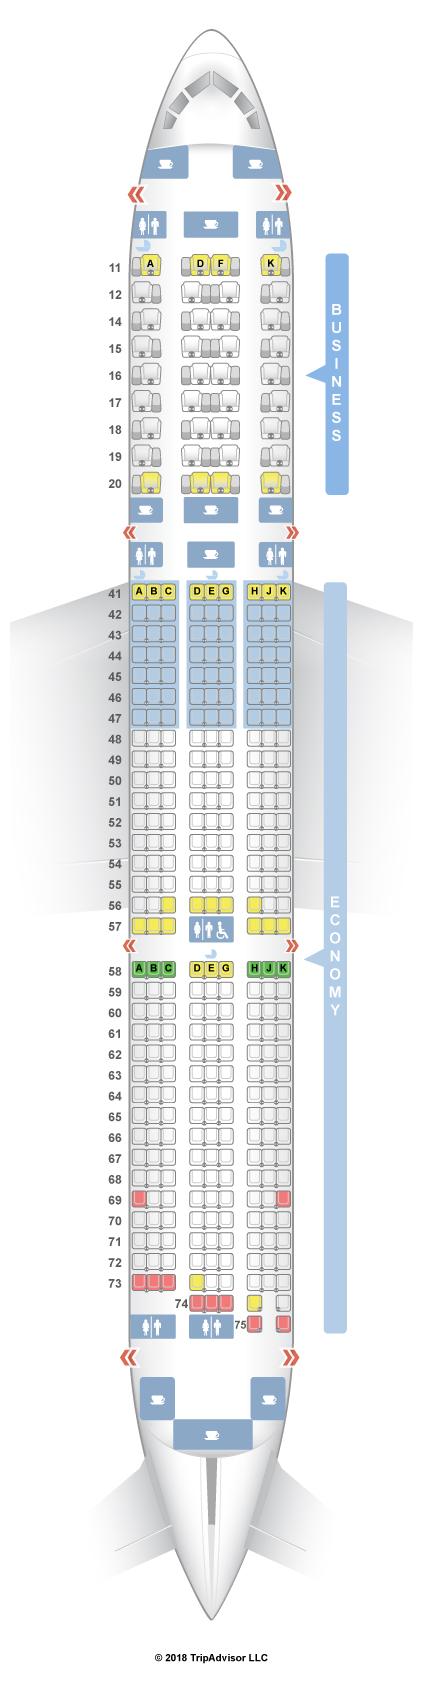 SeatGuru Seat Map Singapore Airlines Boeing 787-10 (78J)